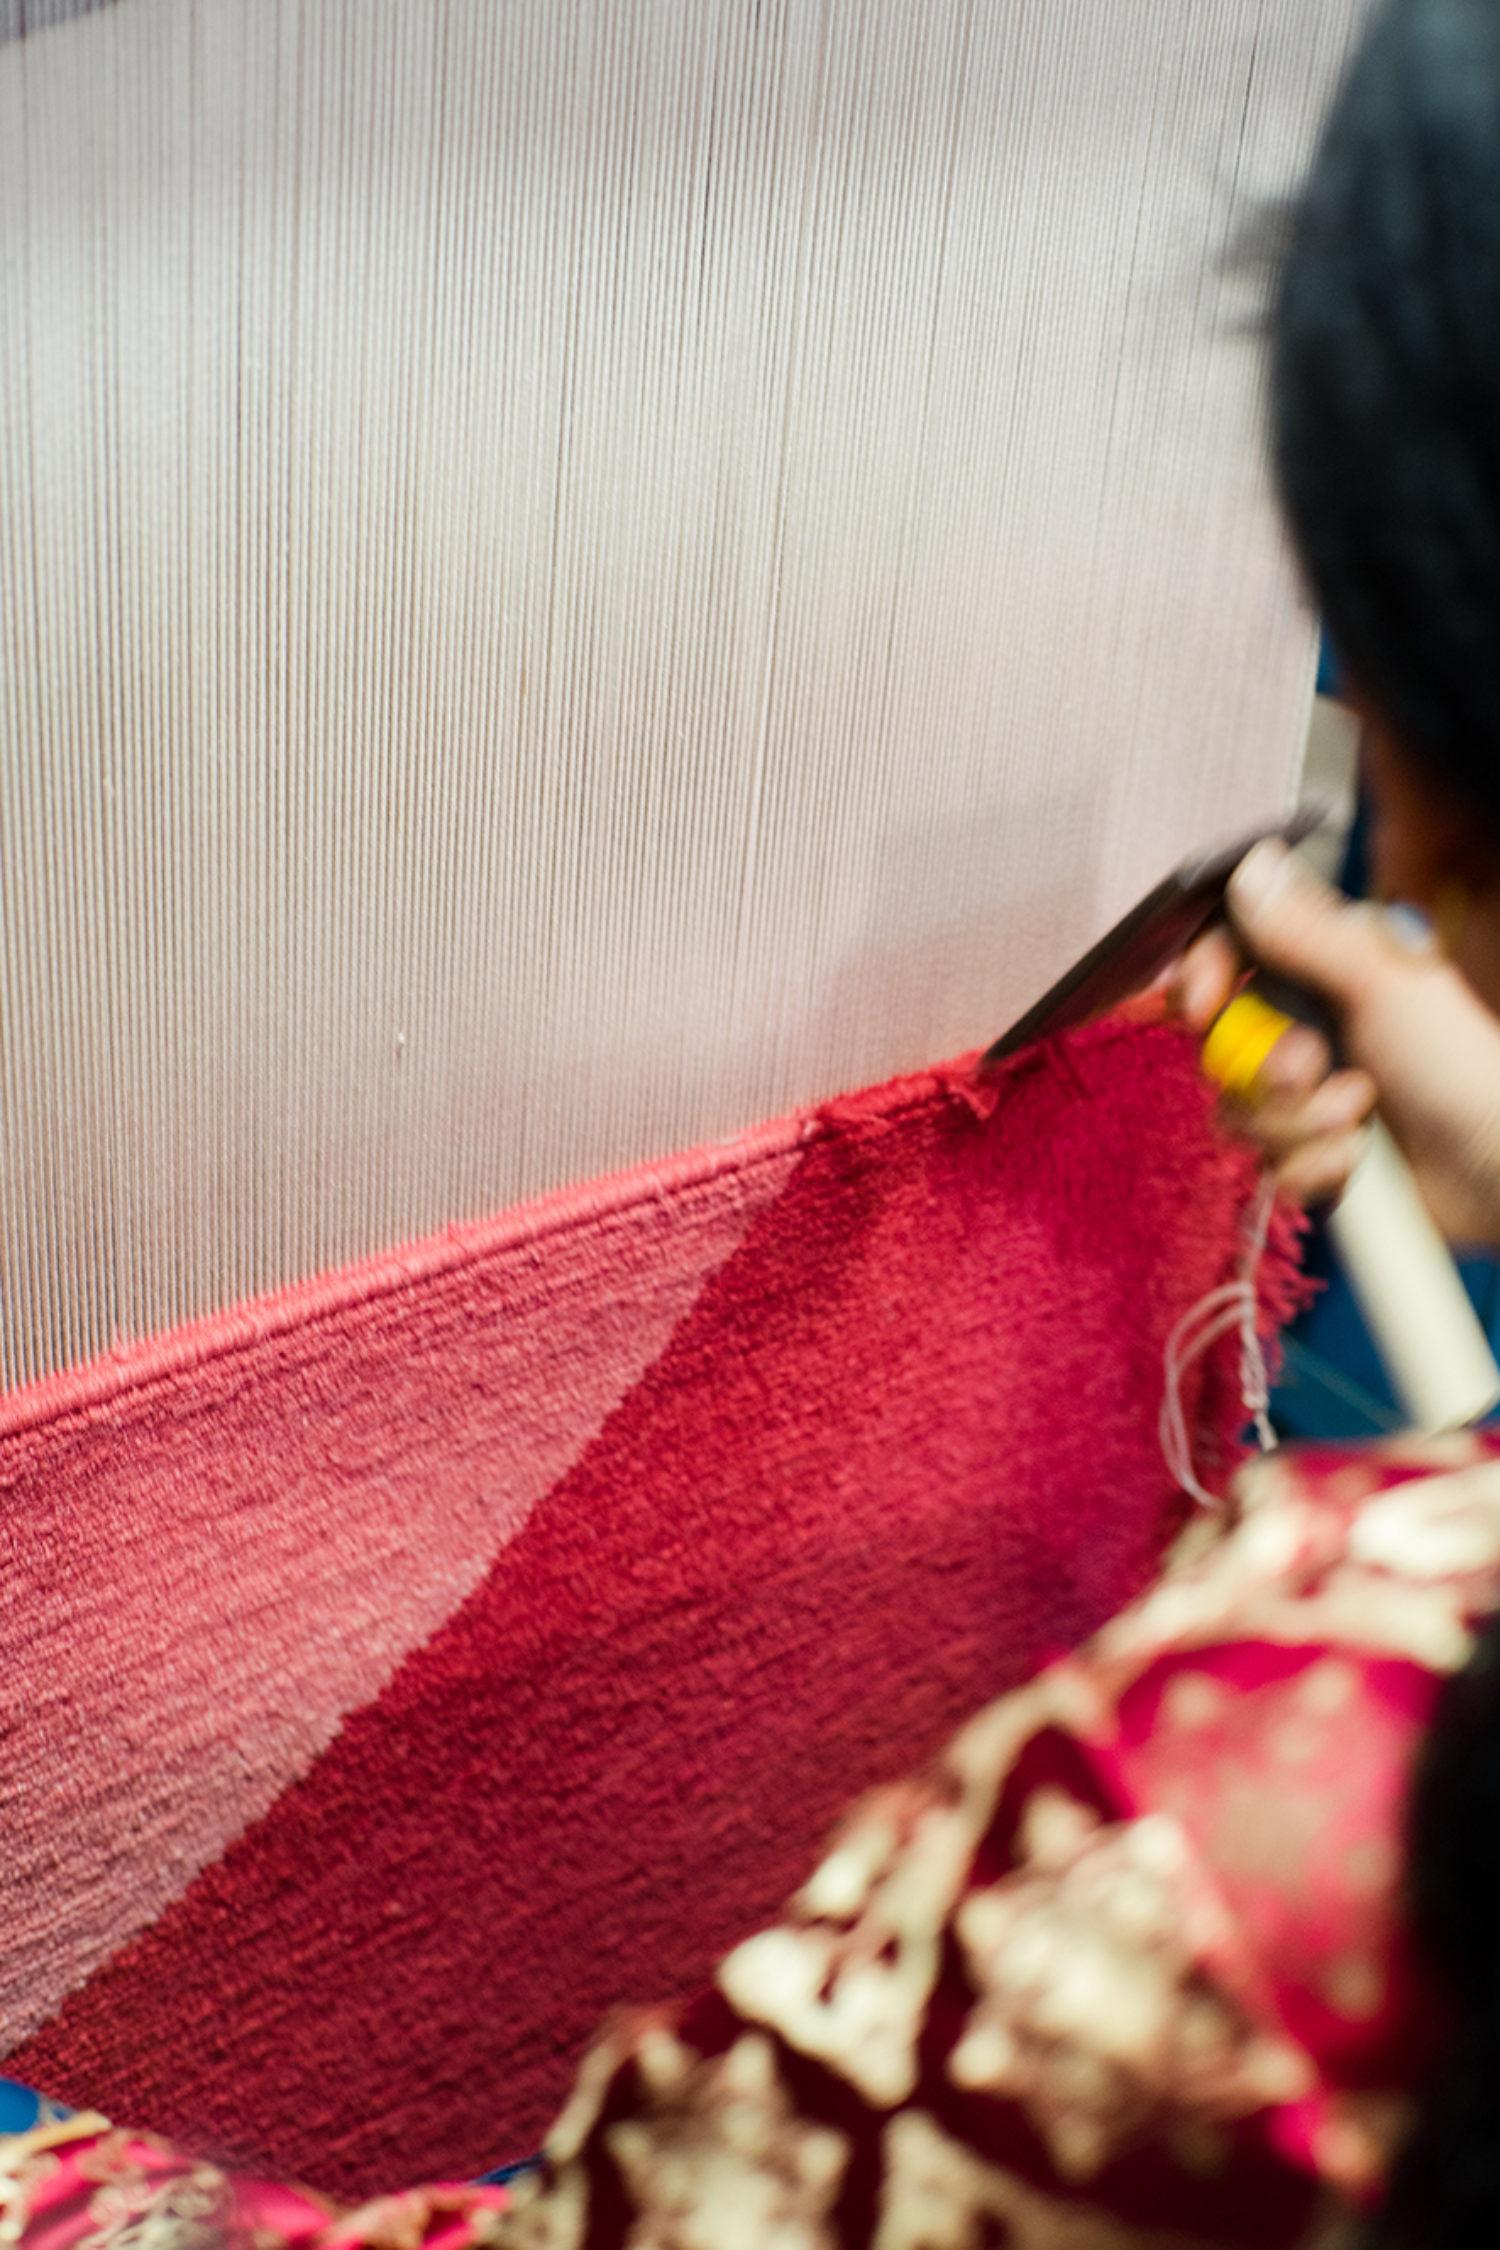 In the making: FLOOR_STORY x Child Studio Weaving process